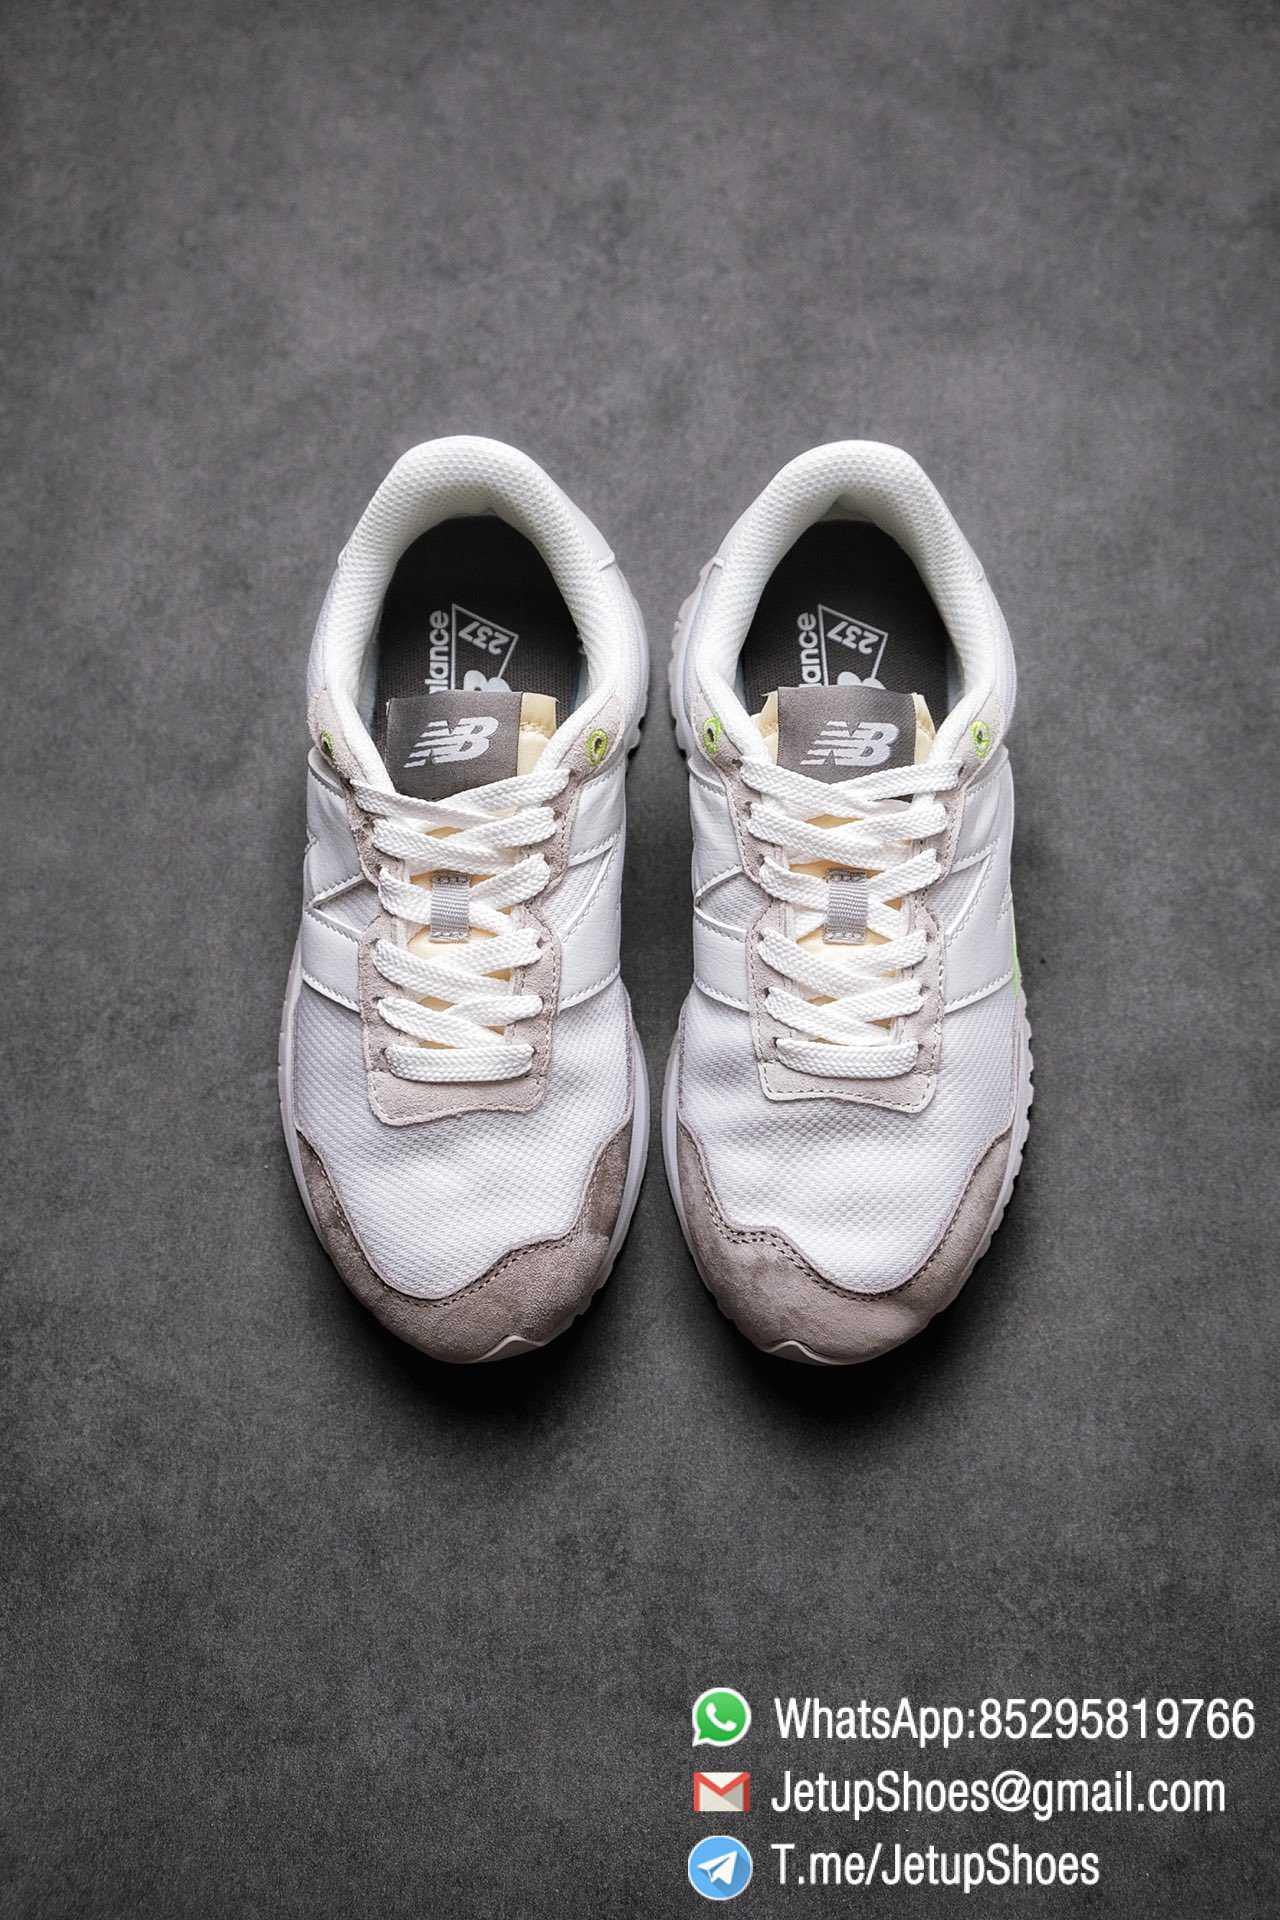 Best Replica New Balance 237 Niko x 237 Grey Green SKU MS237SL1 High Quality Fake Sneakers 02